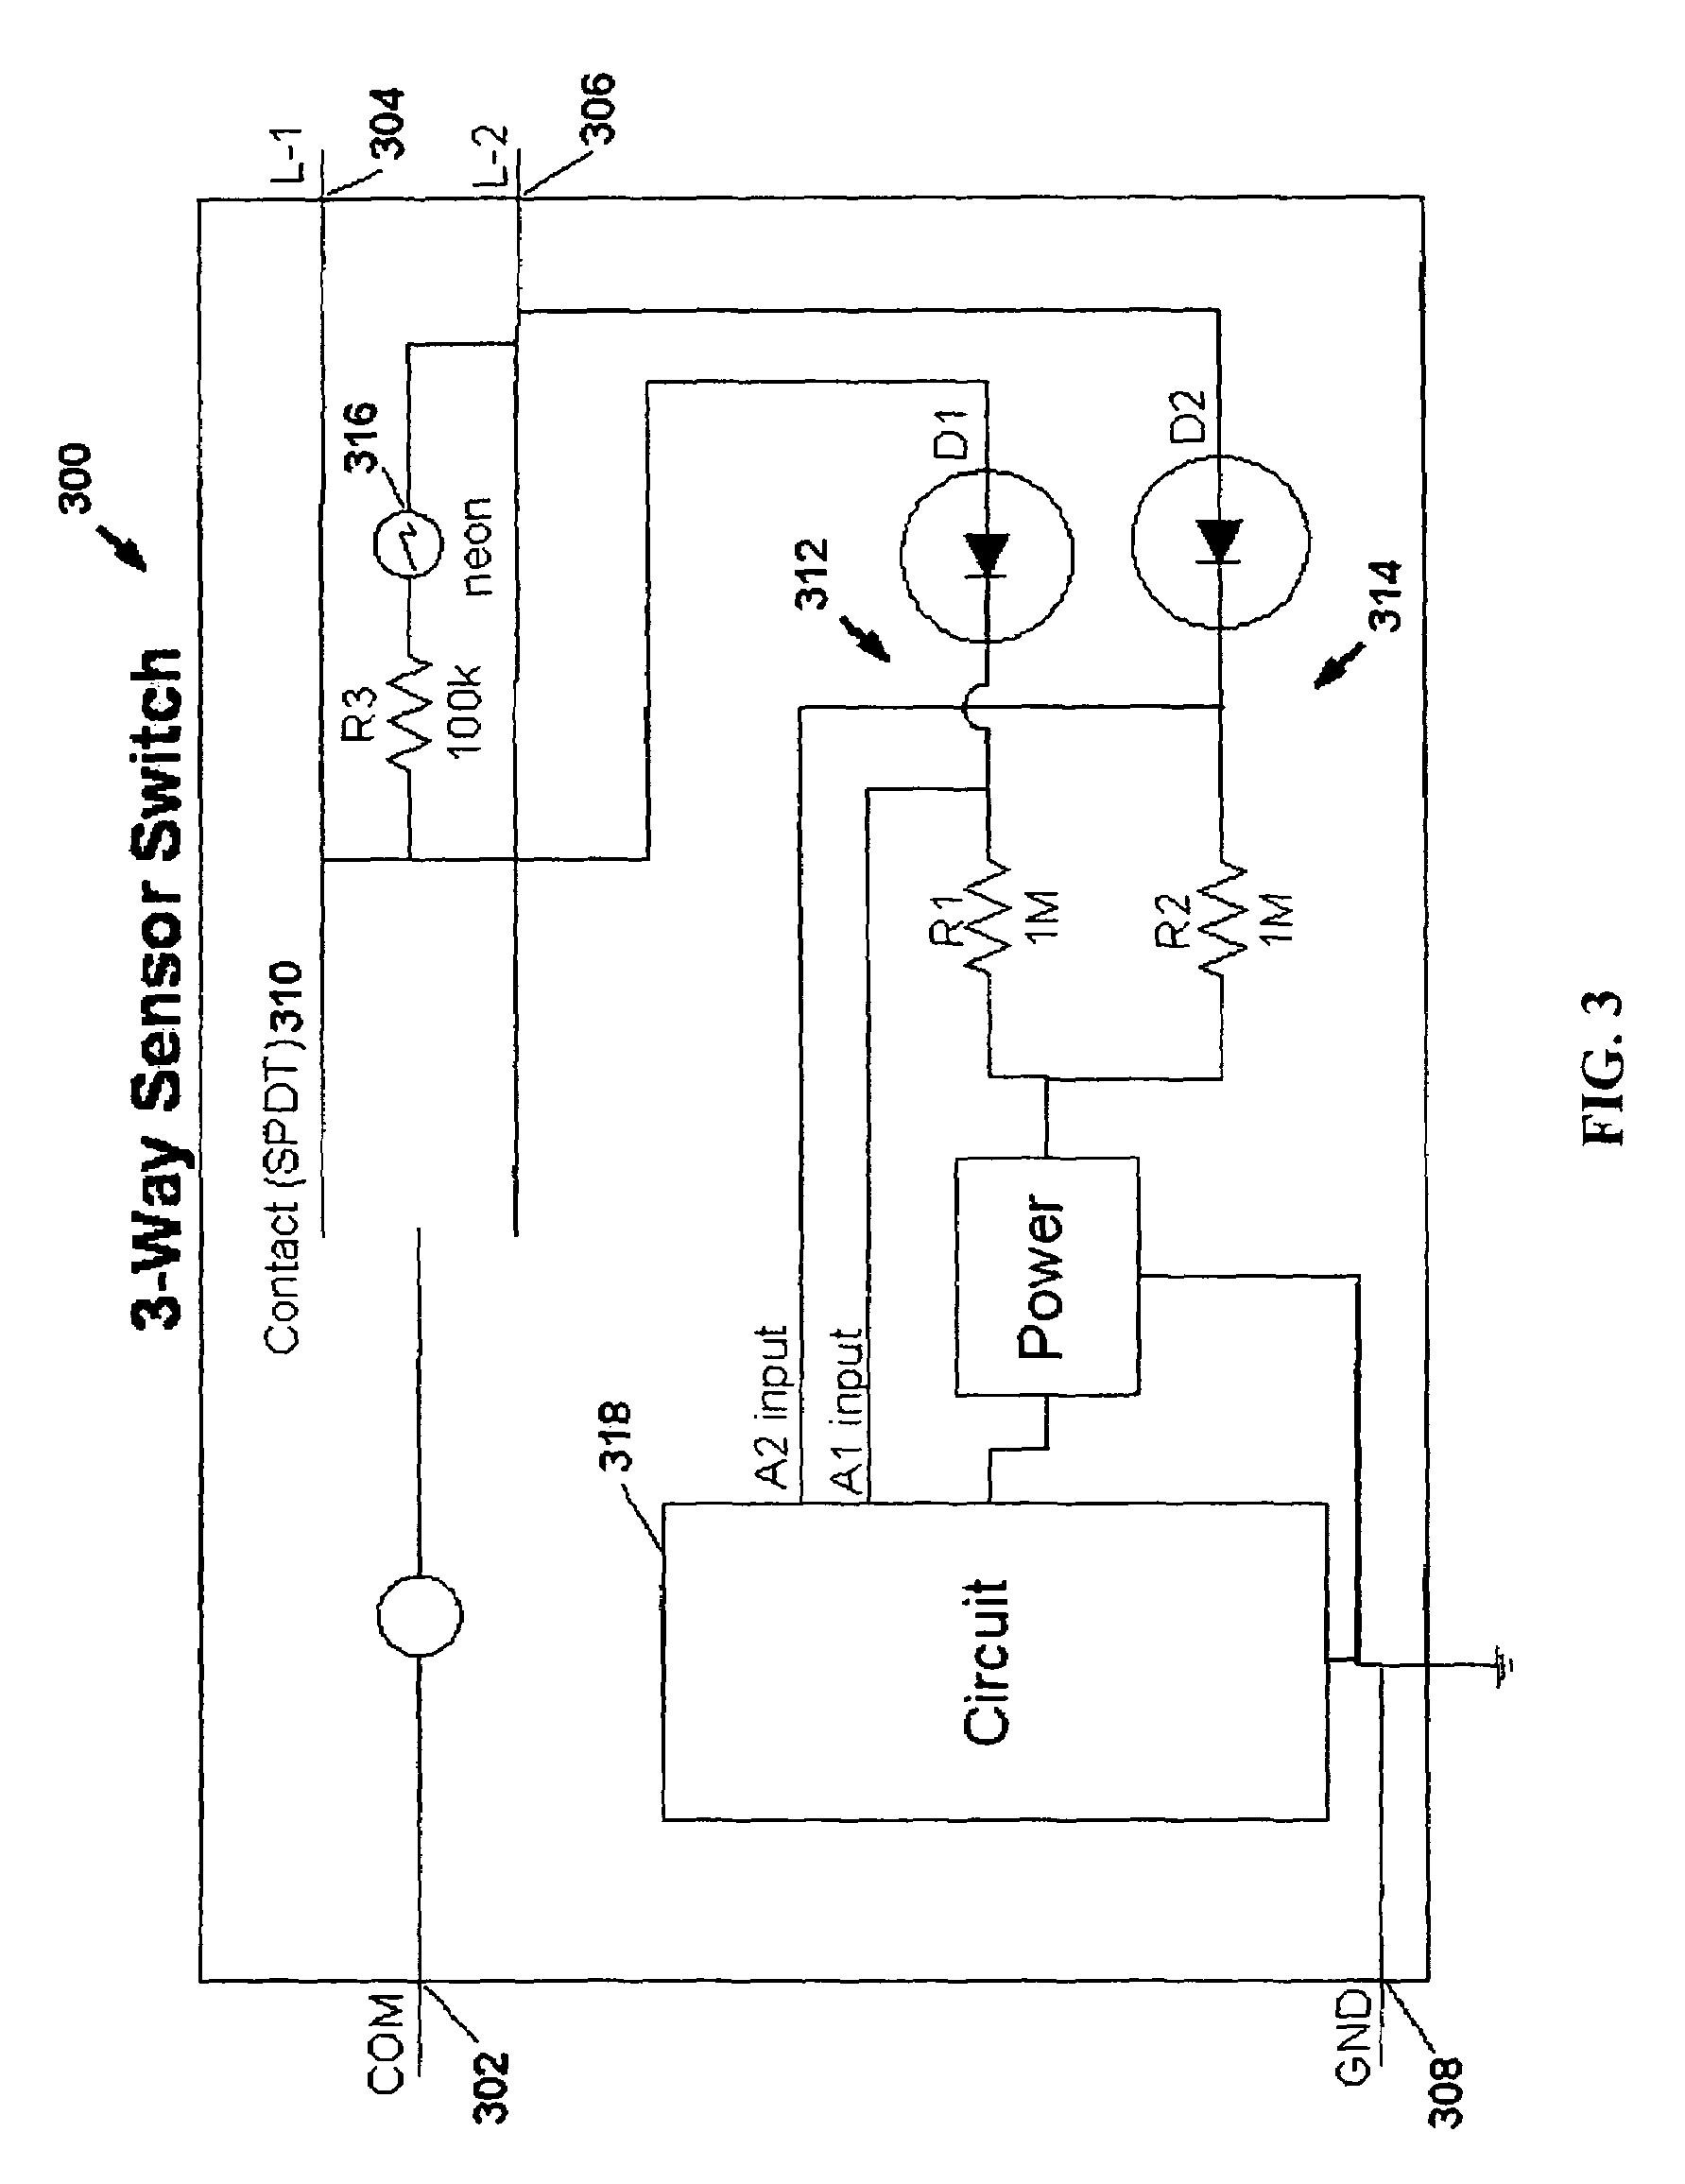 WRG-7488] Three Way Light Wiring Diagram on